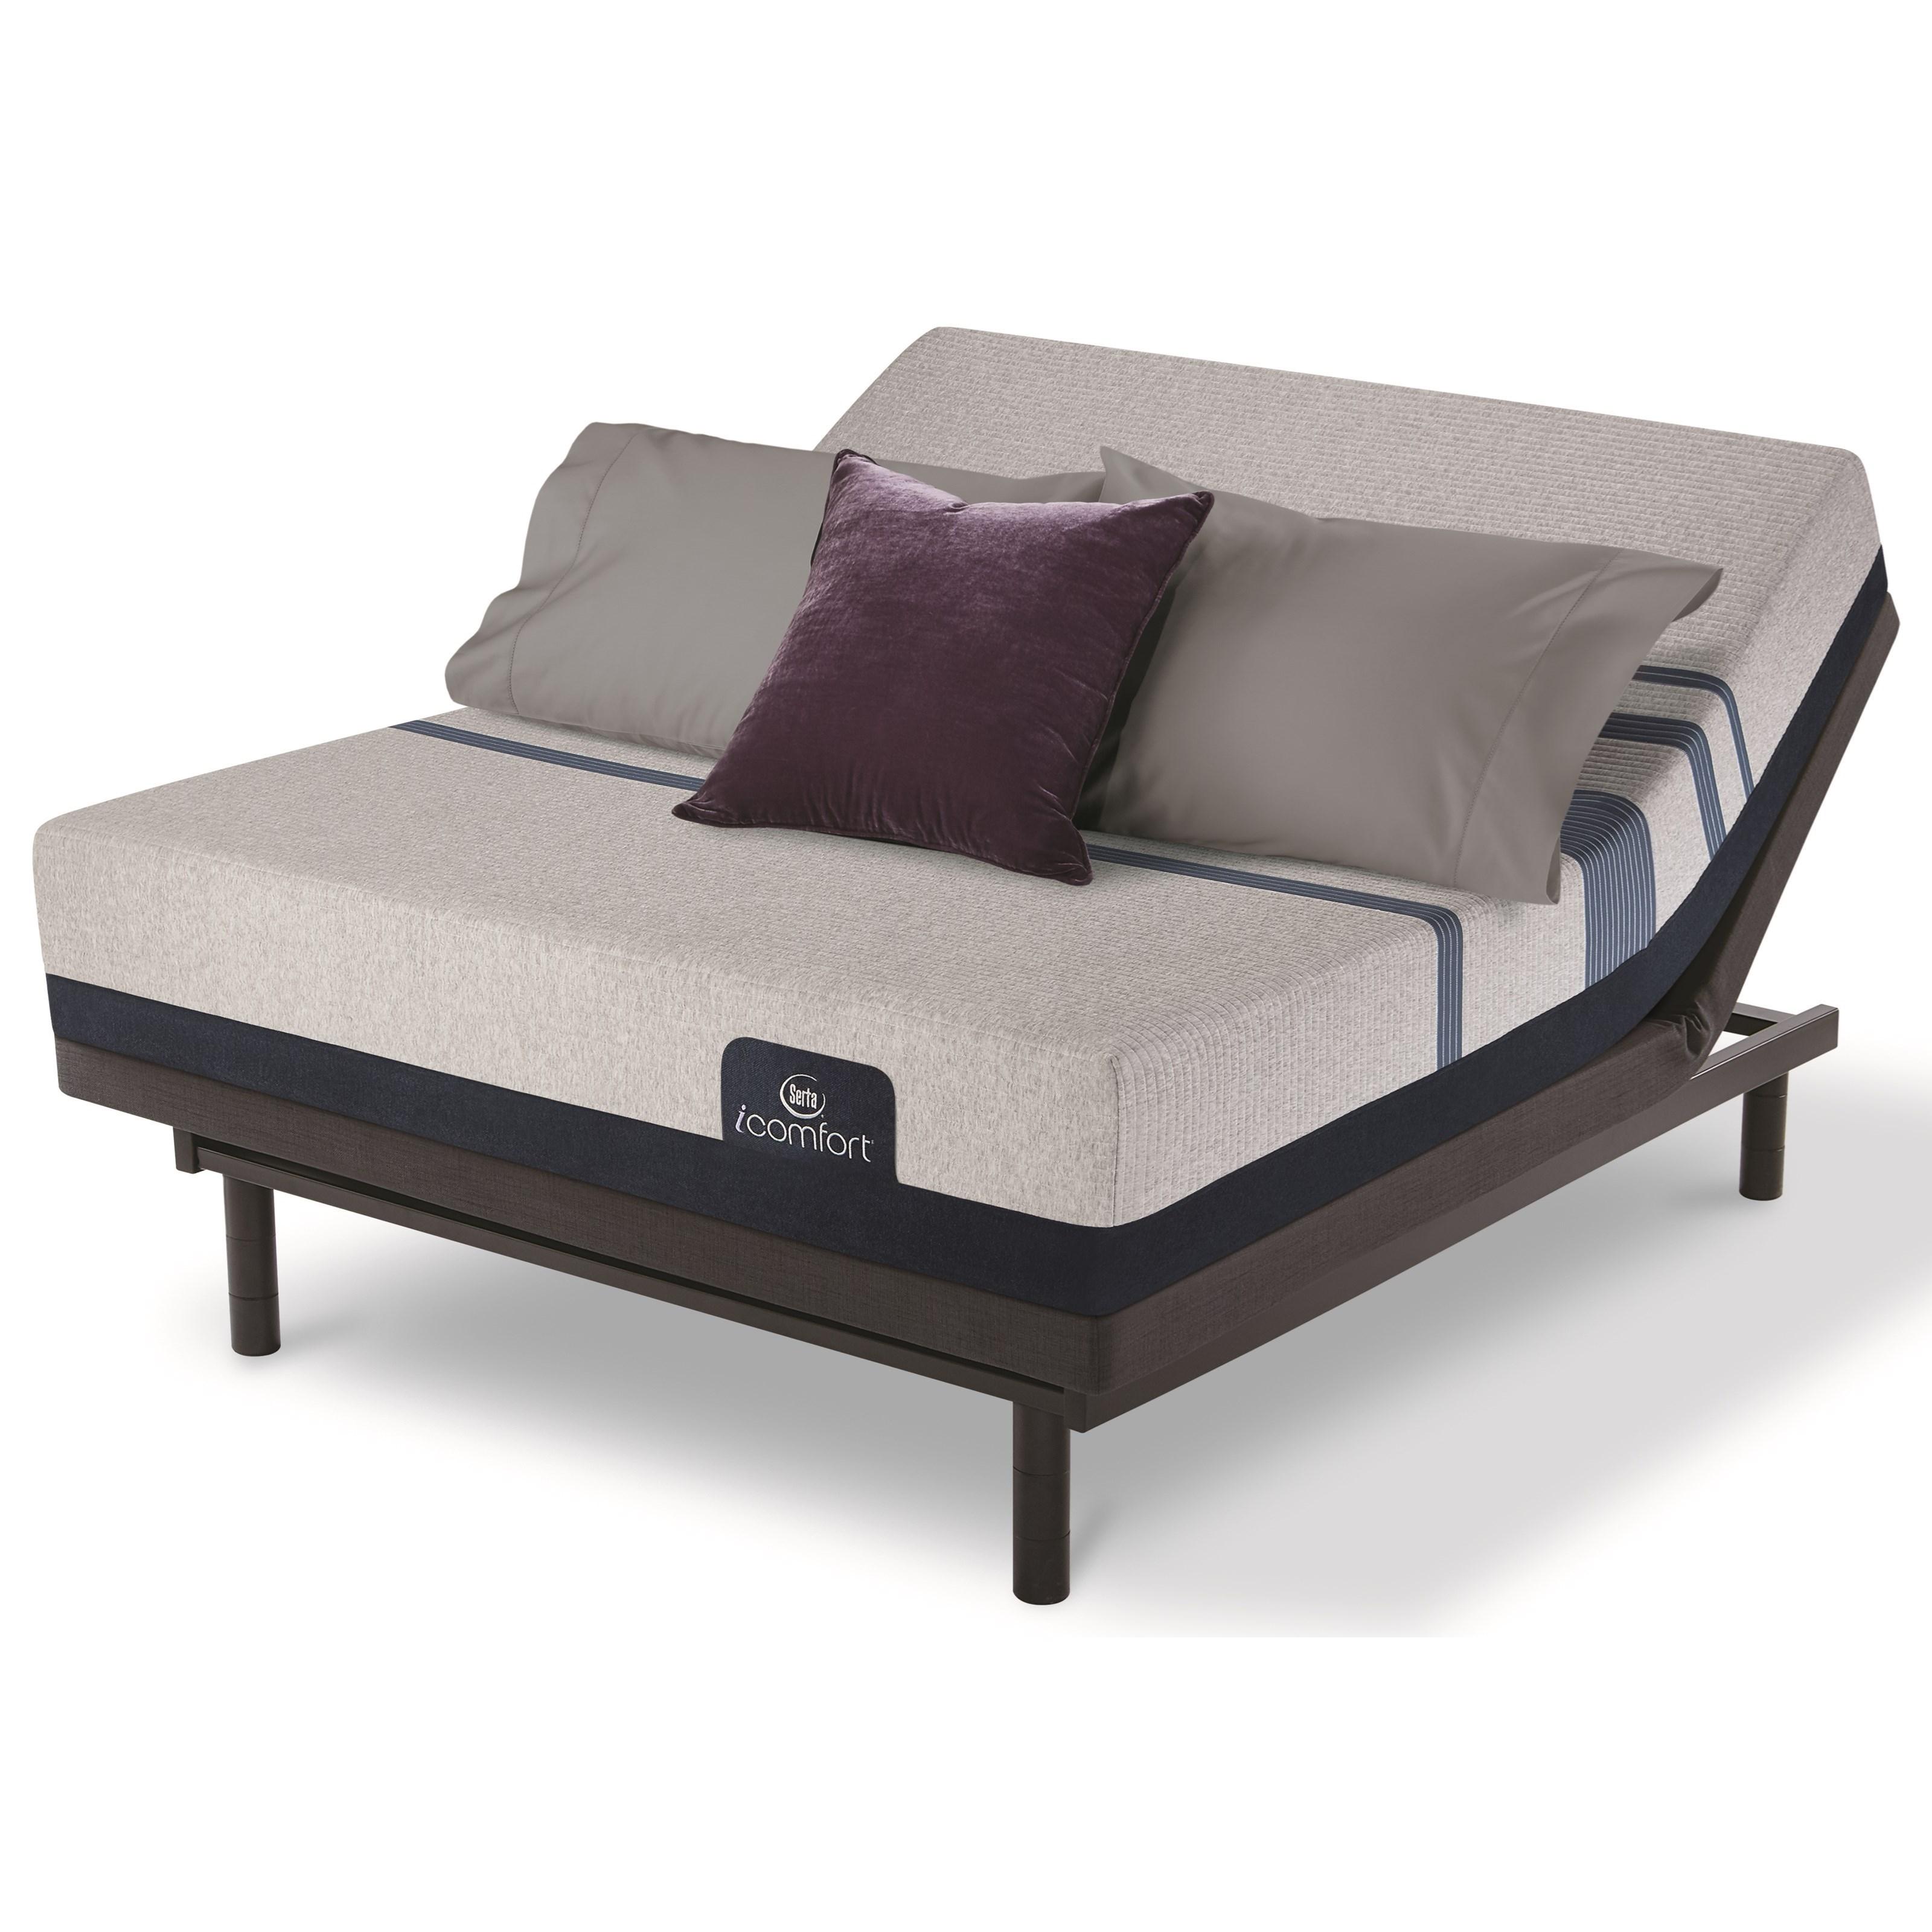 Serta iComfort Blue 300 Firm King Adjustable Set - Item Number: 500801288-1060+500826619-7566